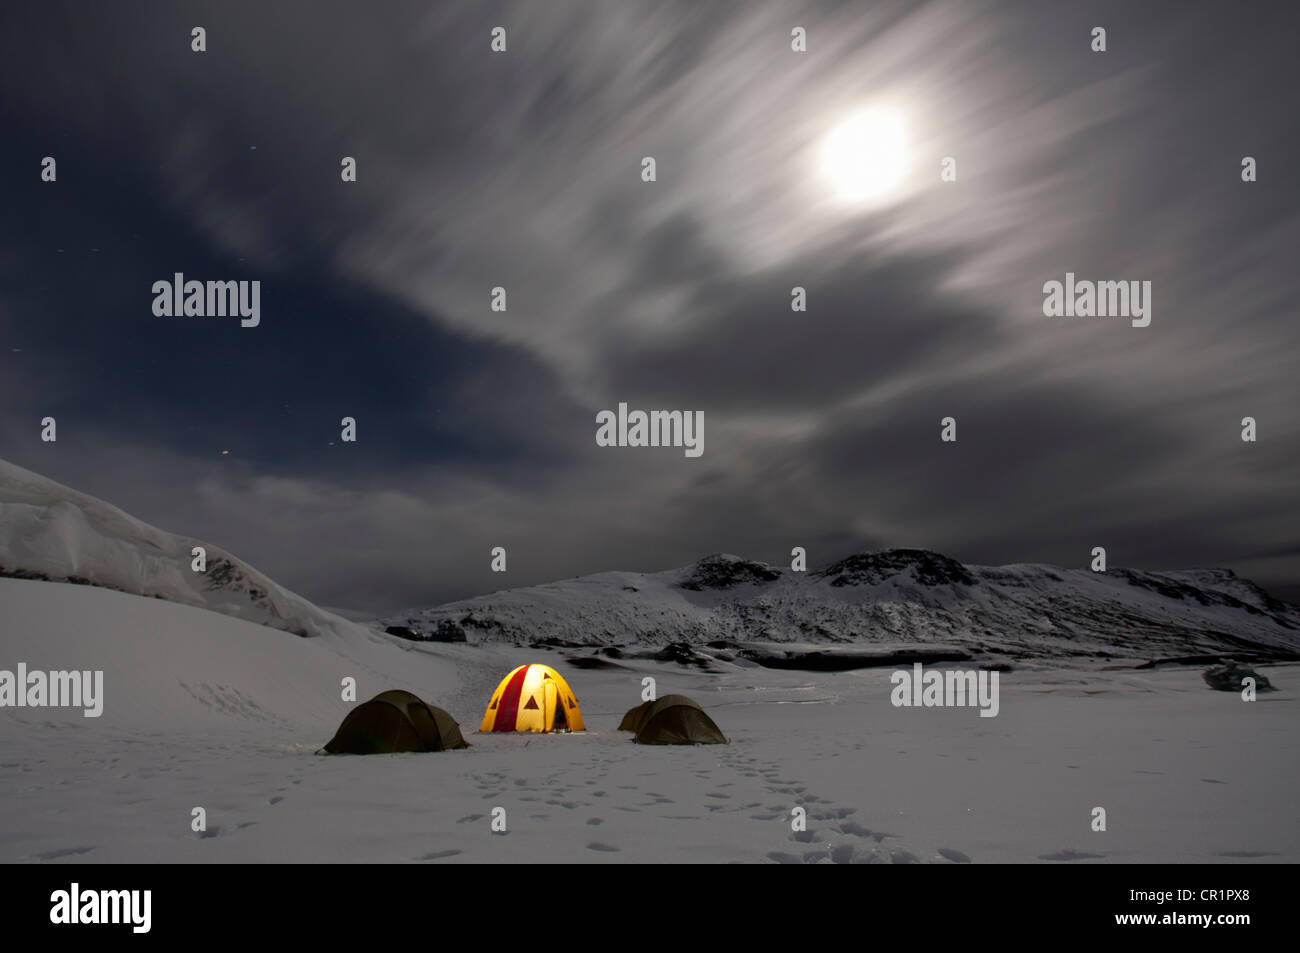 Illuminated tent at glacier campsite - Stock Image